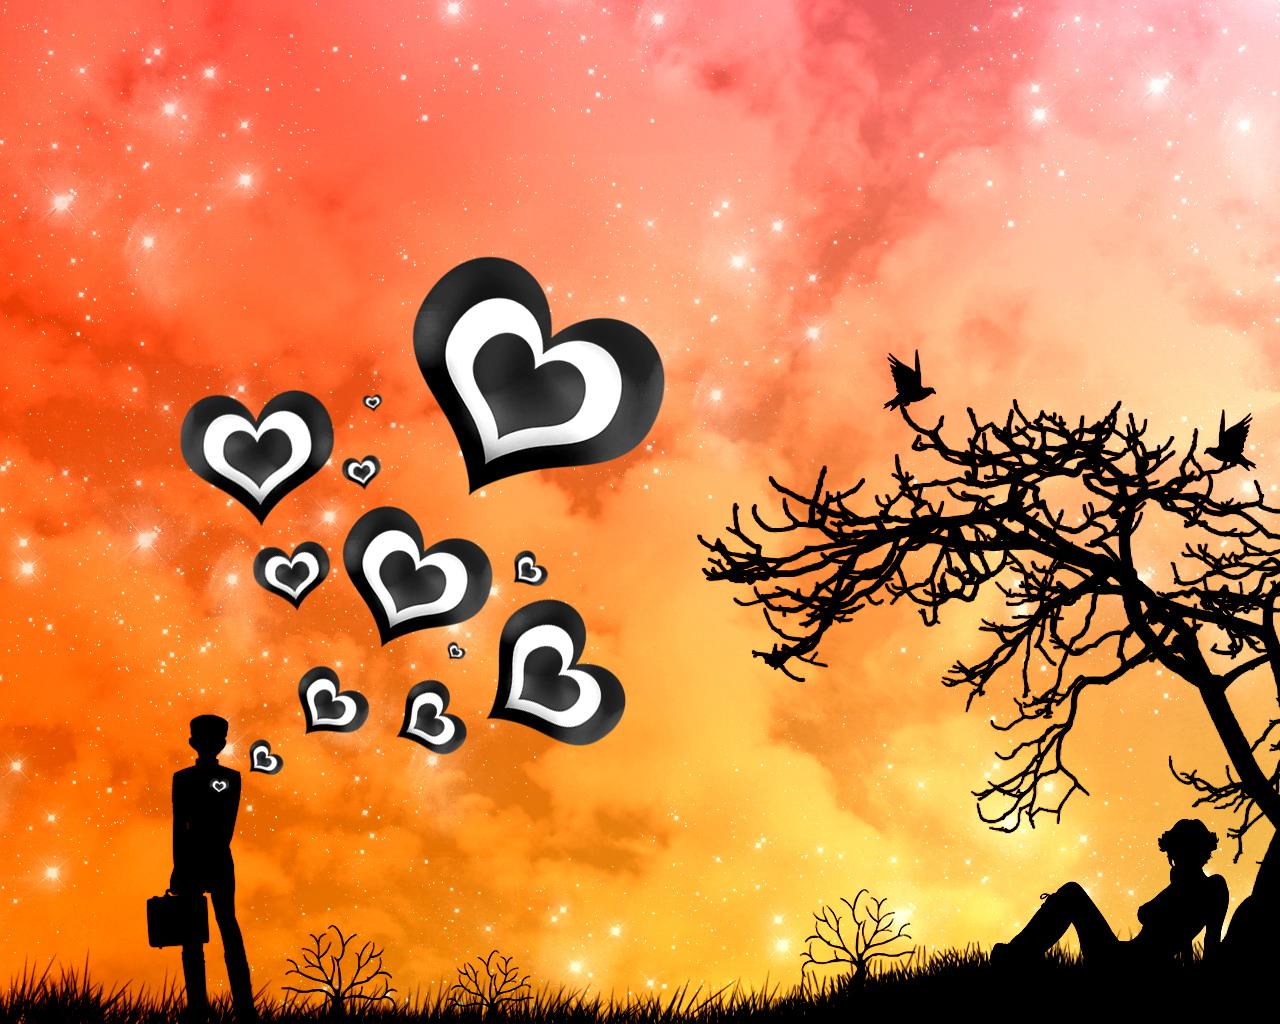 بالصور صور رومانسيه للزوج , اجمل صور لمن تعشق زوجها 677 6